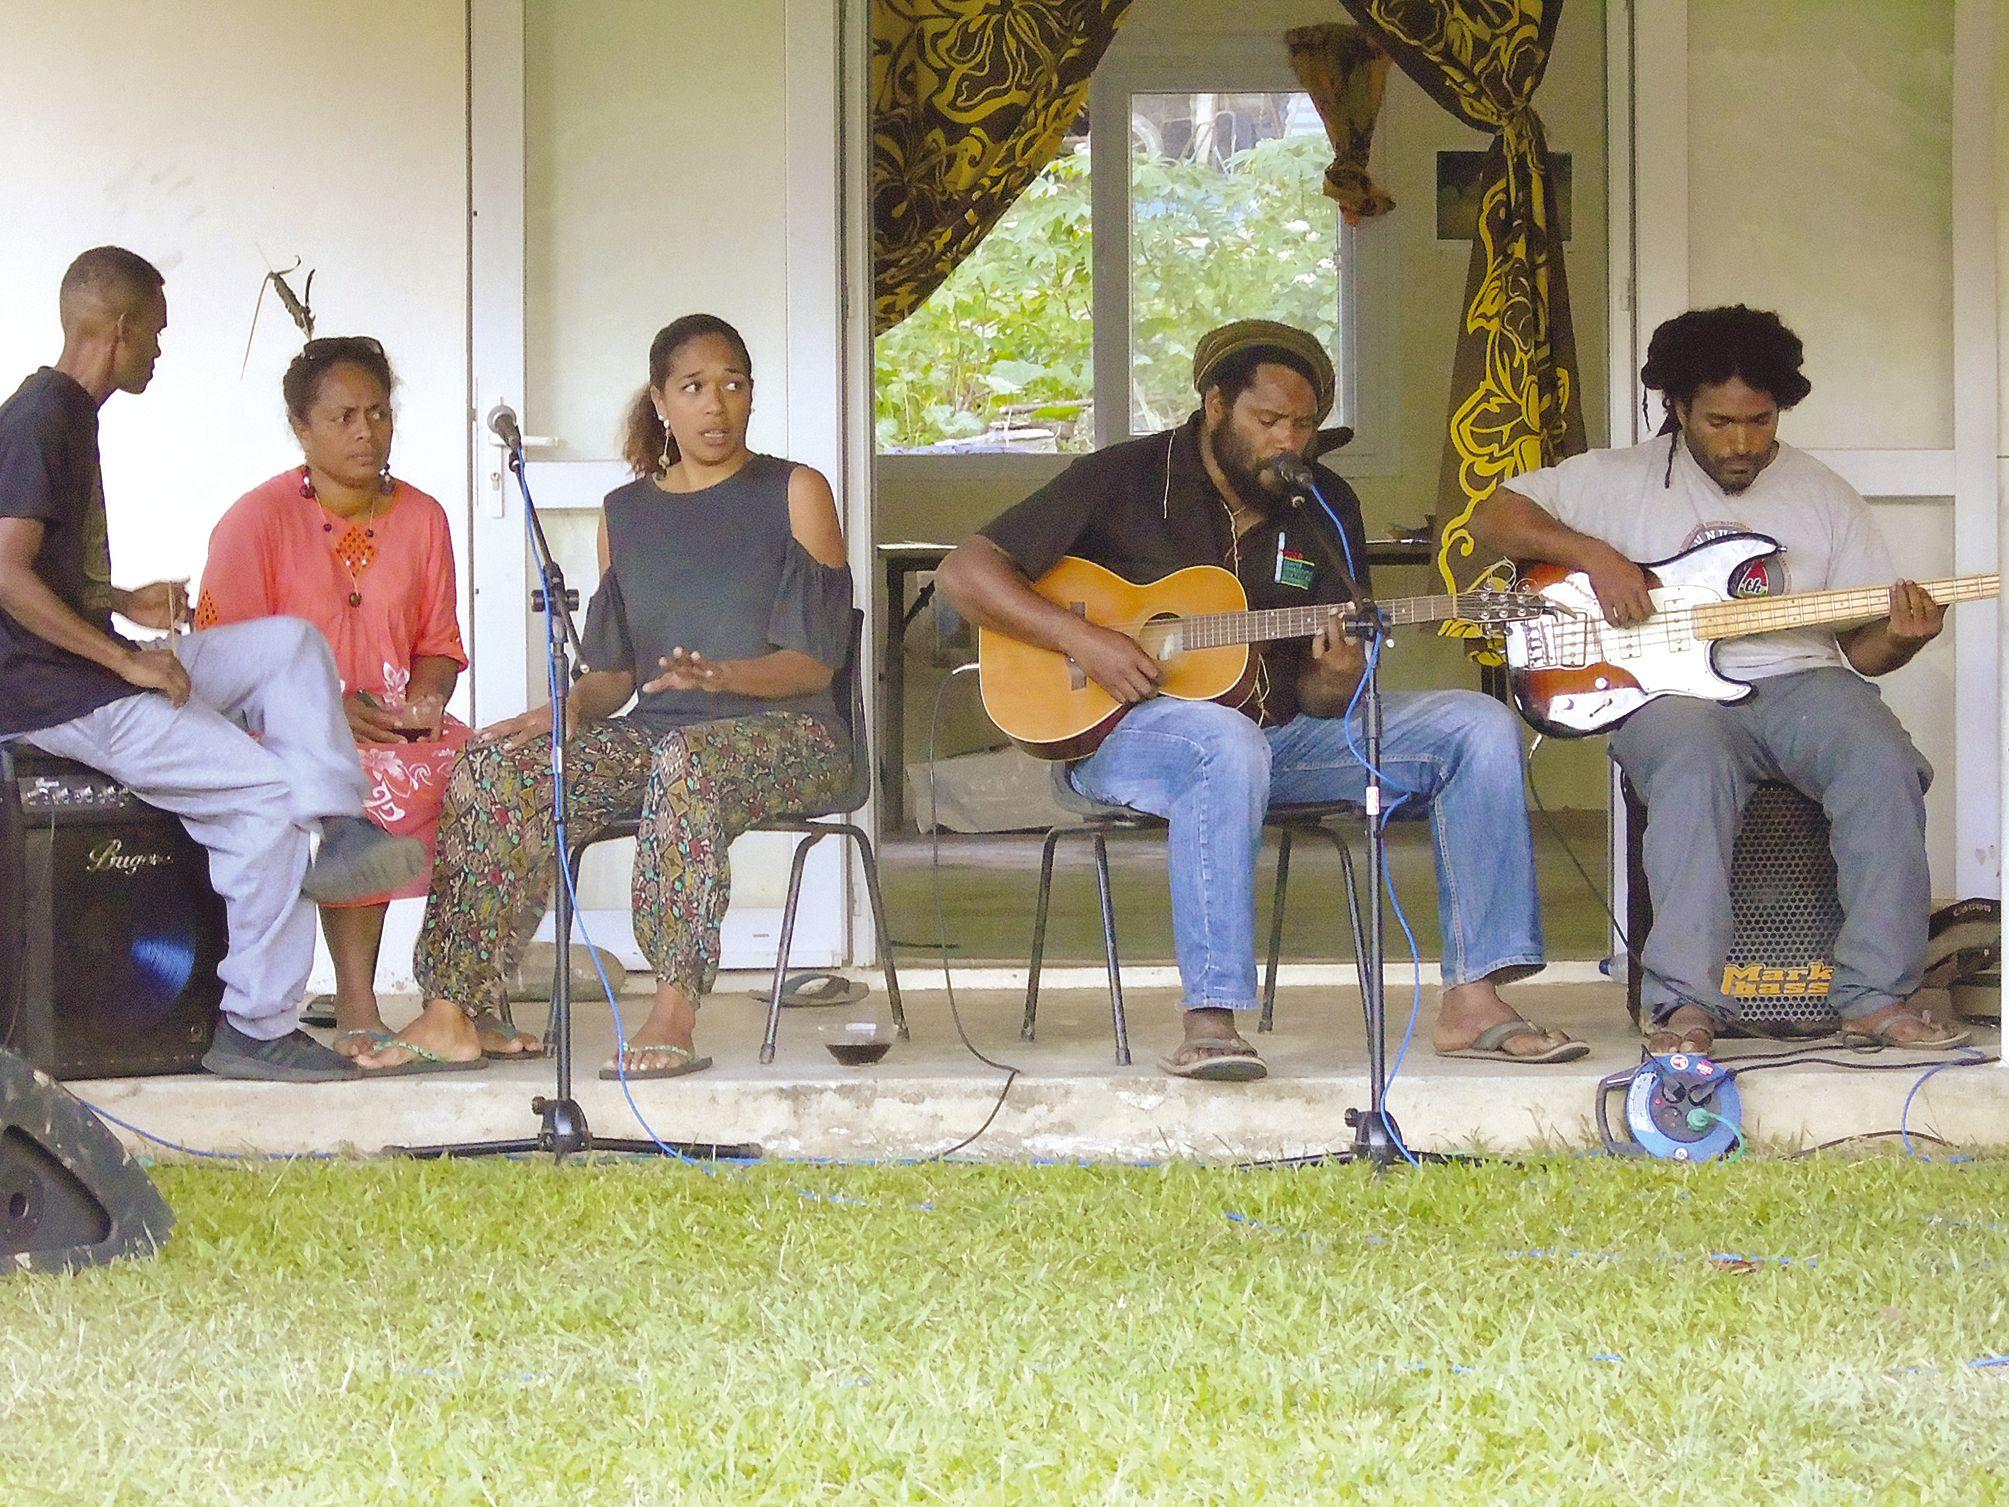 Mercredi, la caravane musicale a animé la tribu de Néouta. Photo Benoît Guichon